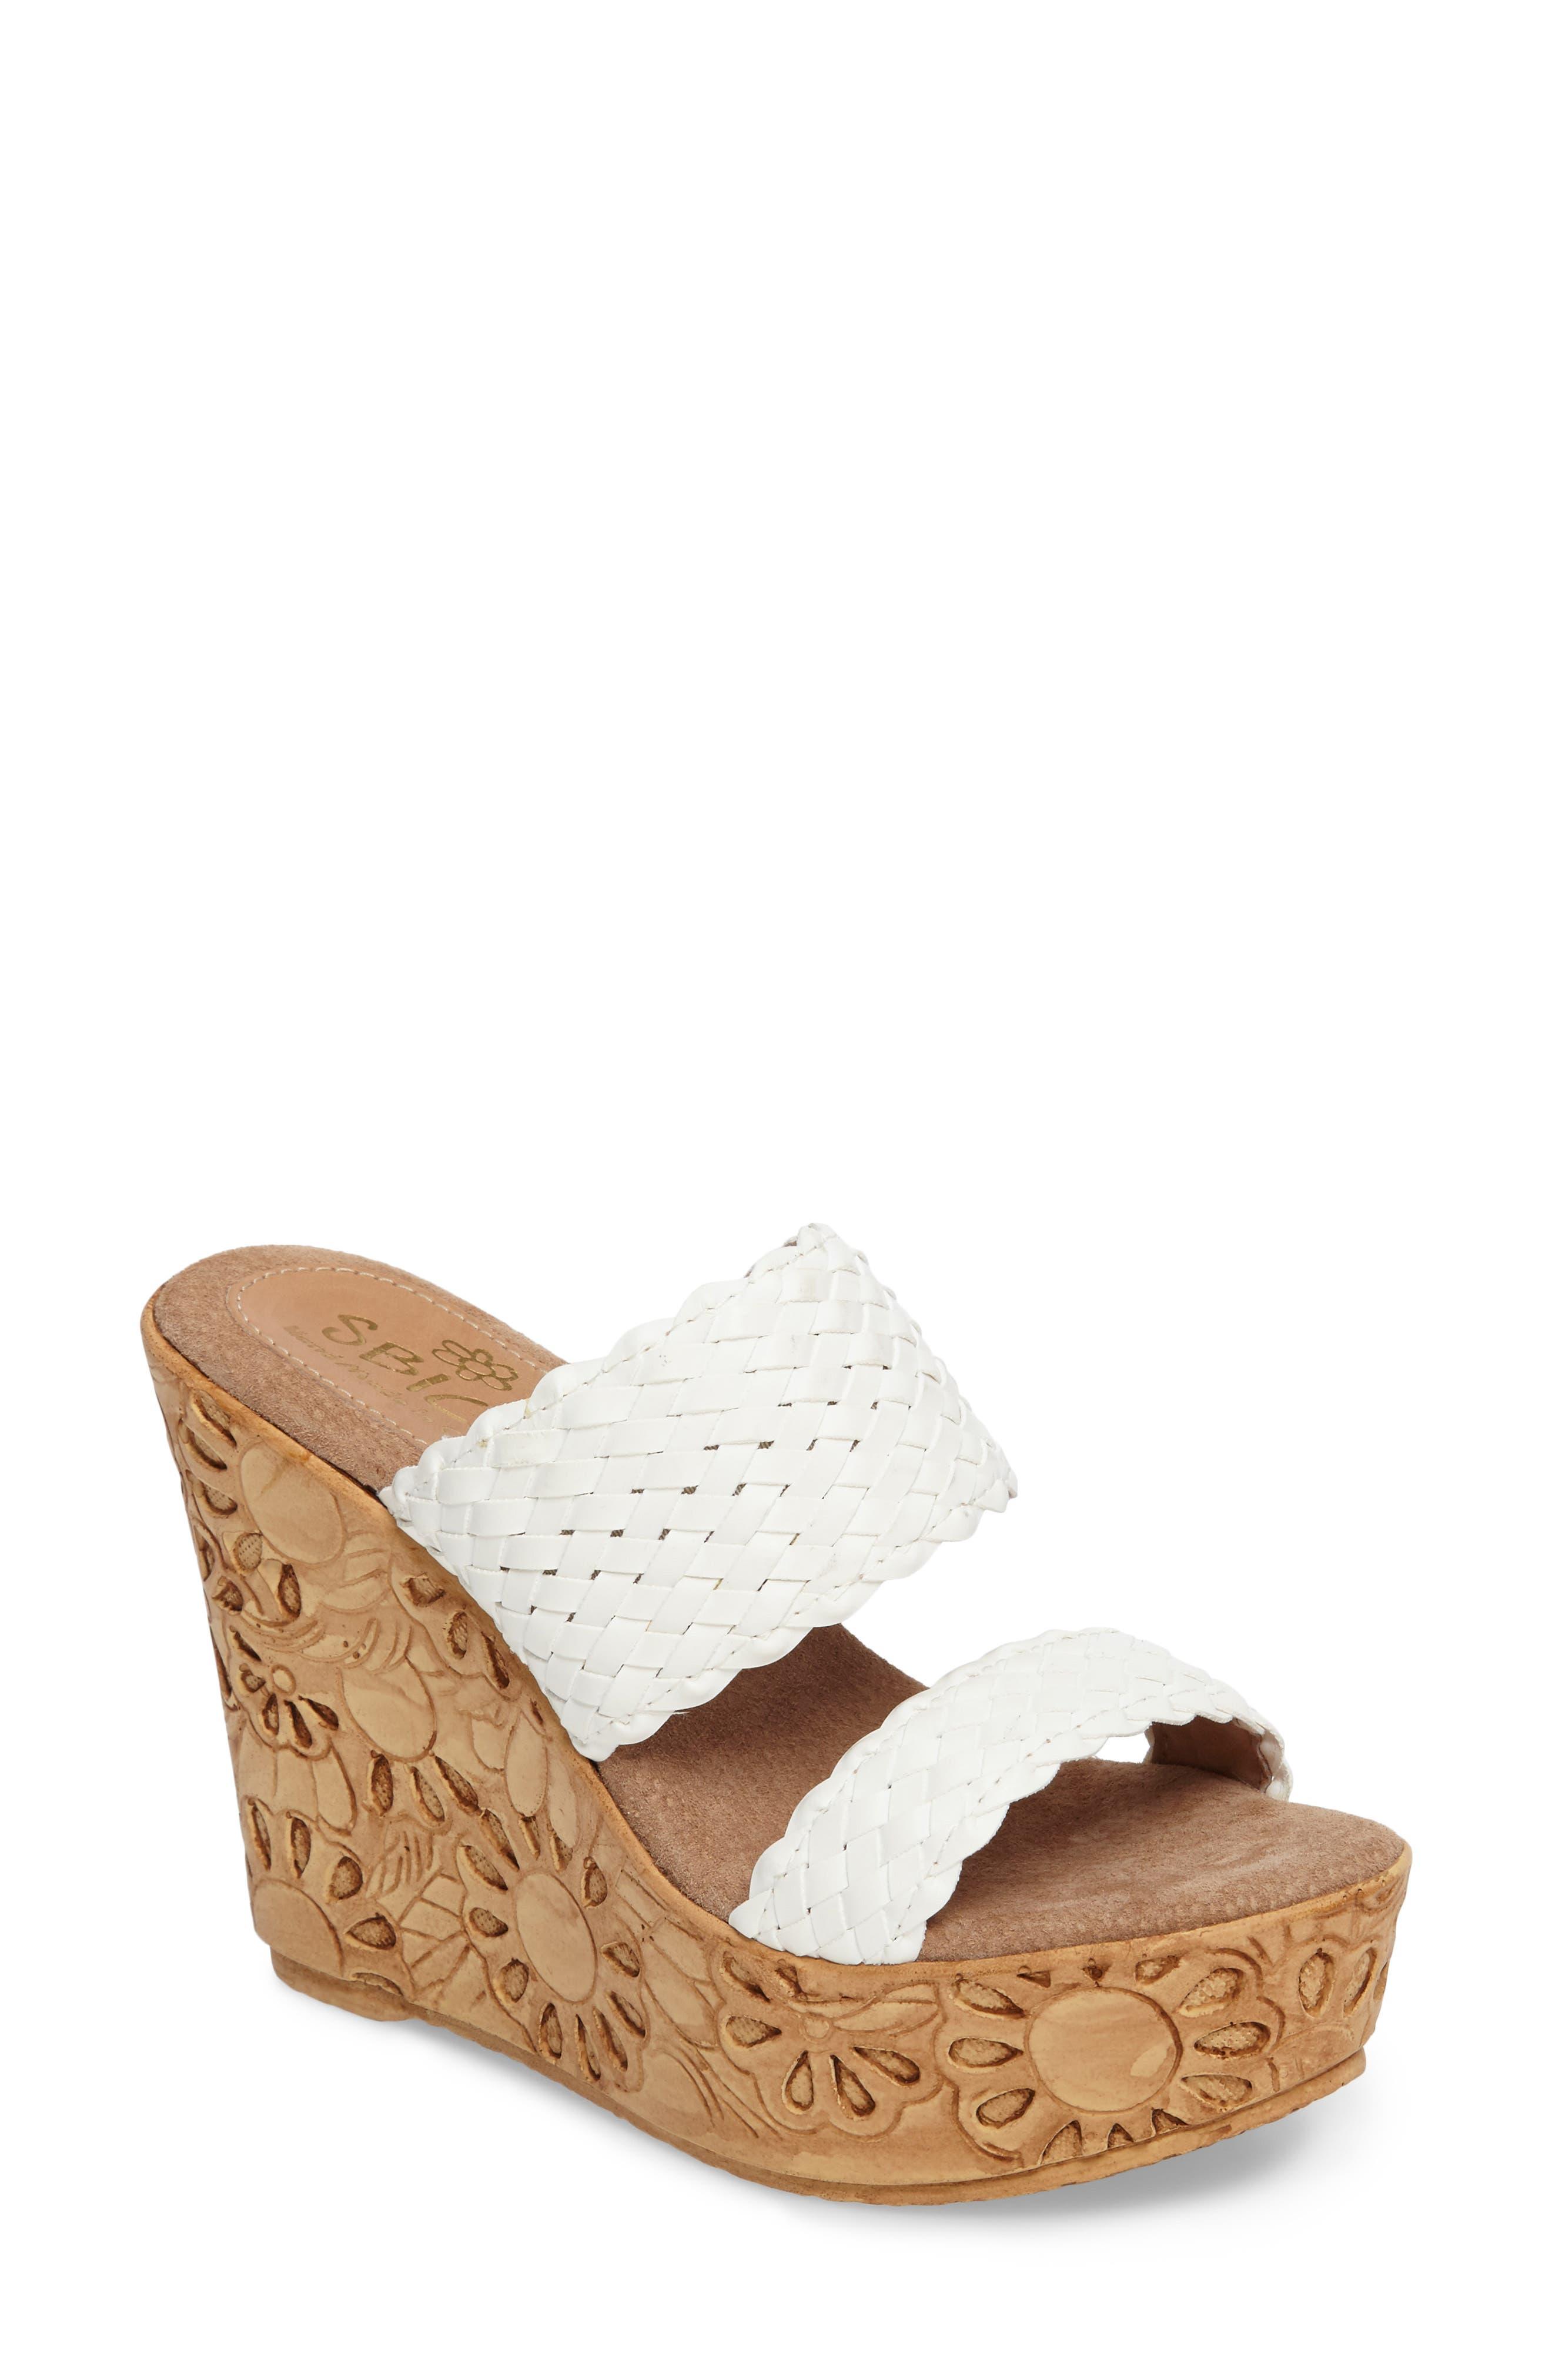 Halima Platform Wedge Sandal,                             Main thumbnail 1, color,                             White Leather